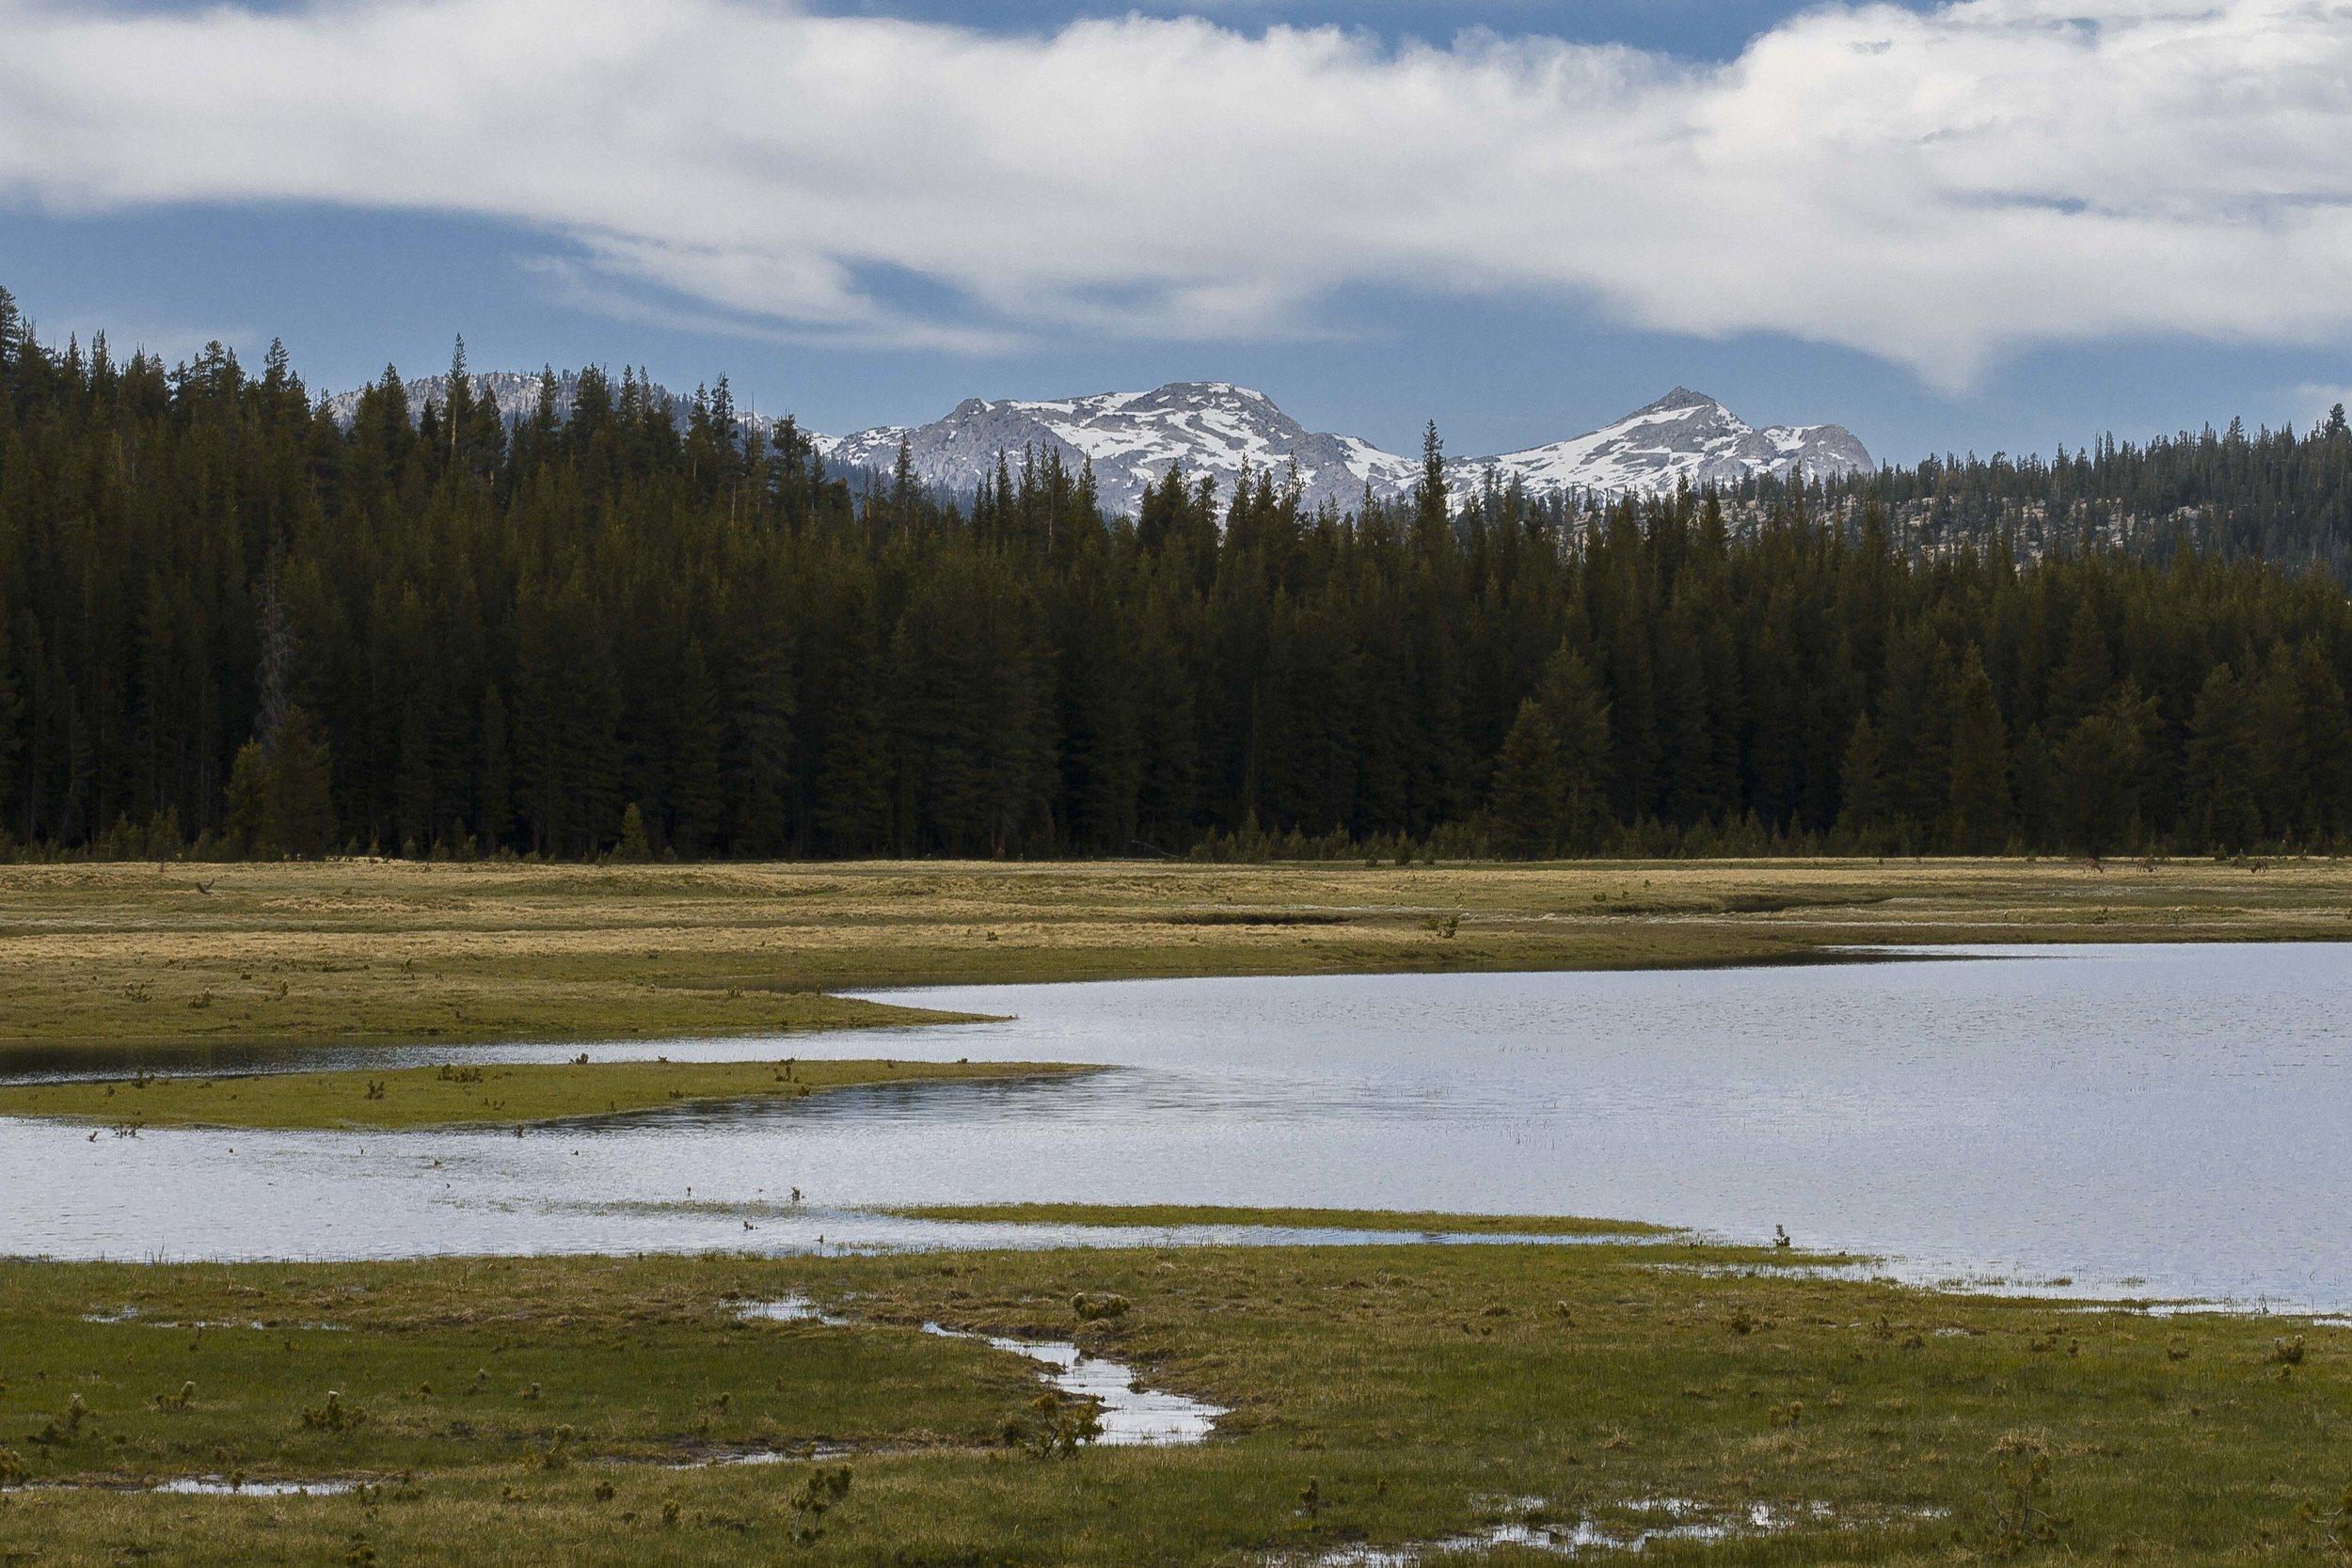 Glade, 2016  Yosemite National Park, California, United States  100mm f/20 1/100 sec ISO 200